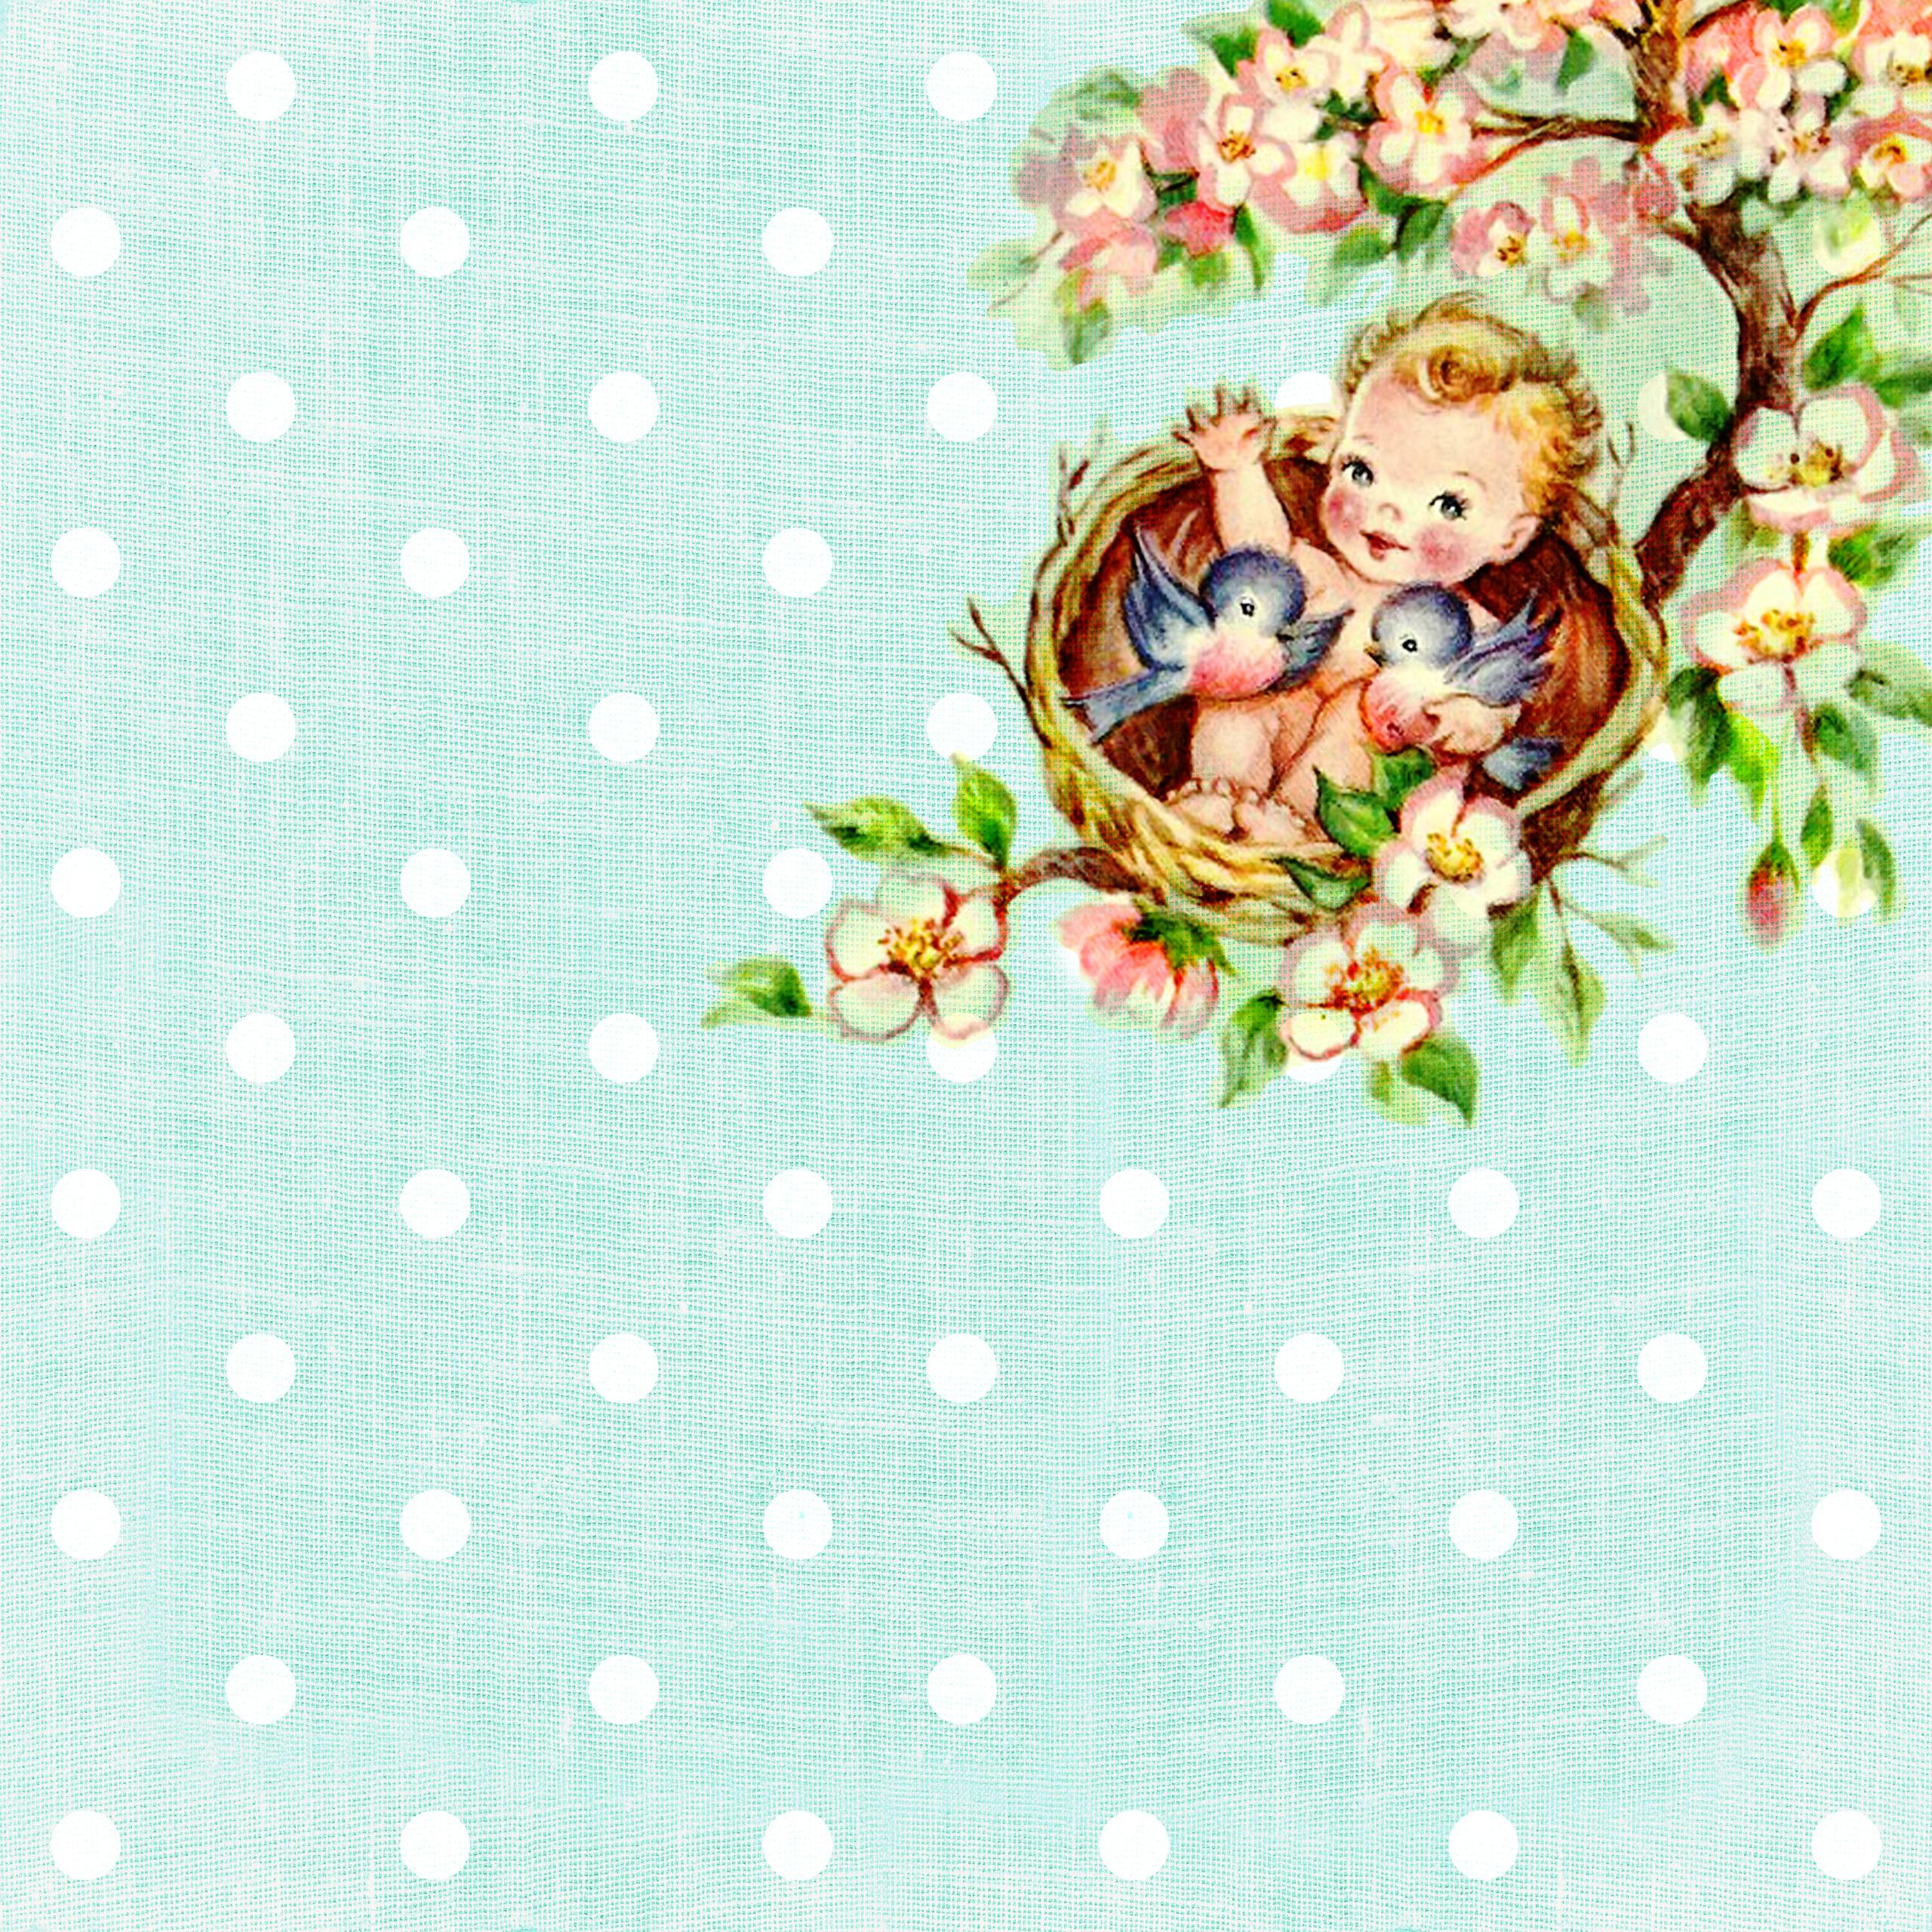 Free Digital Scrapbooking Paper Vintage Baby Fptfy 4